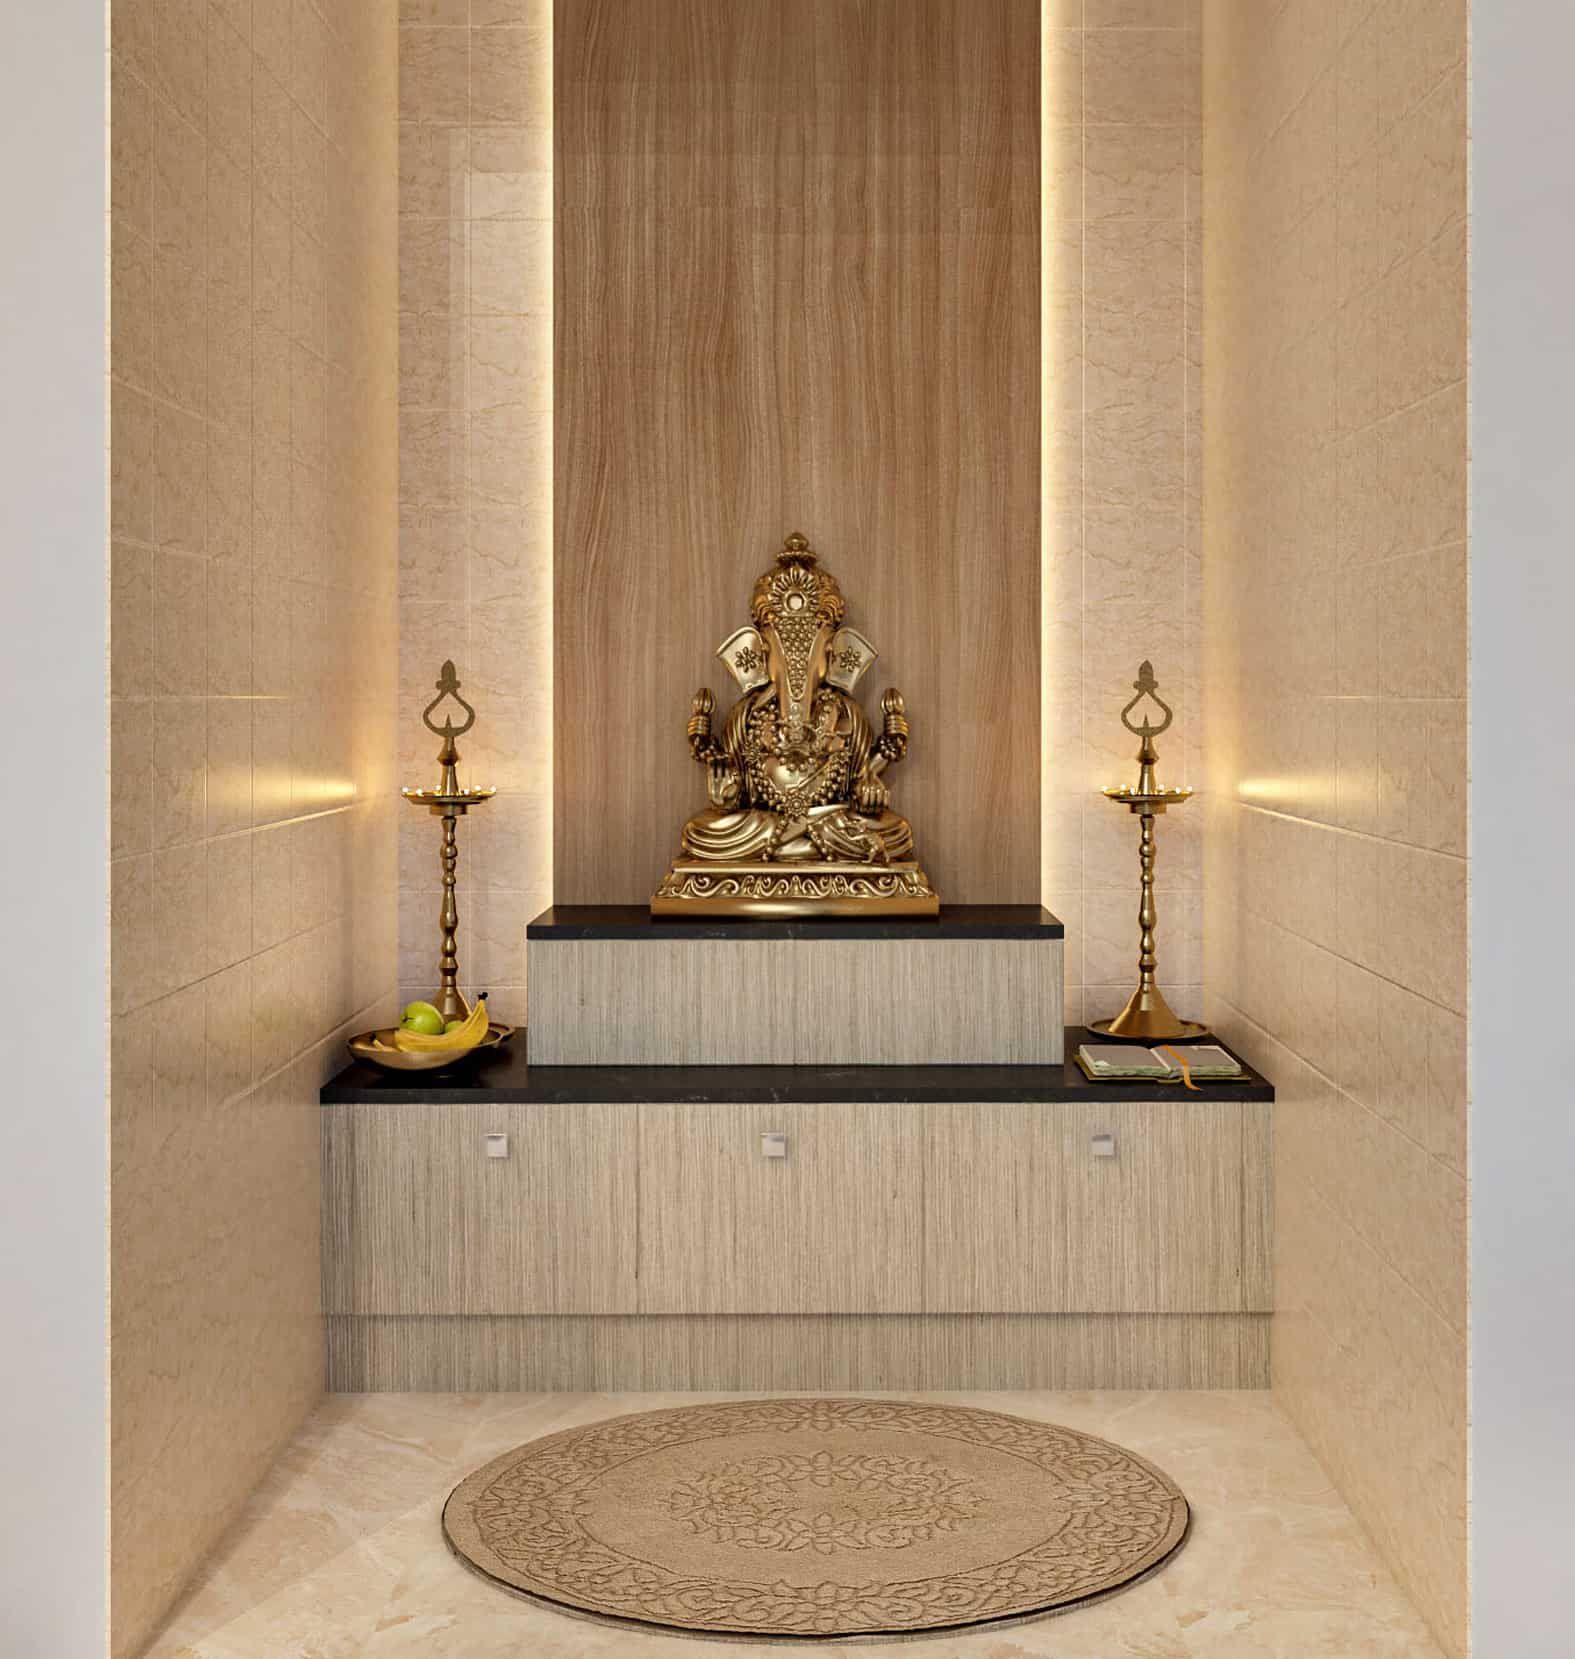 Living Room Interiordesign Bangalore: Home Interior Designers In Banashankari